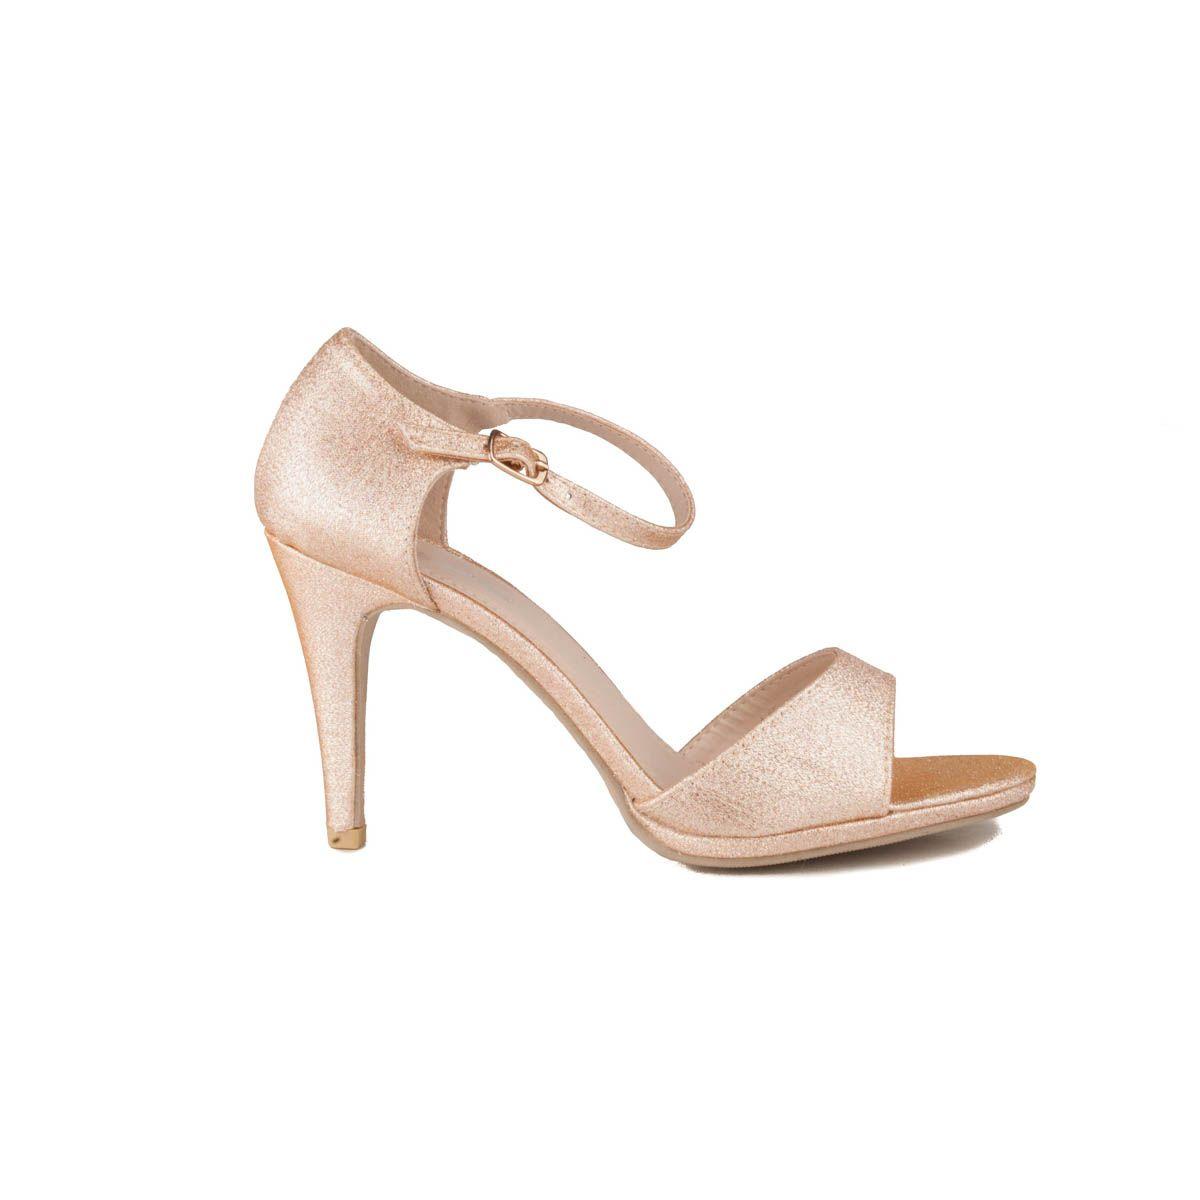 Montevita Heeled Sandal in Gold